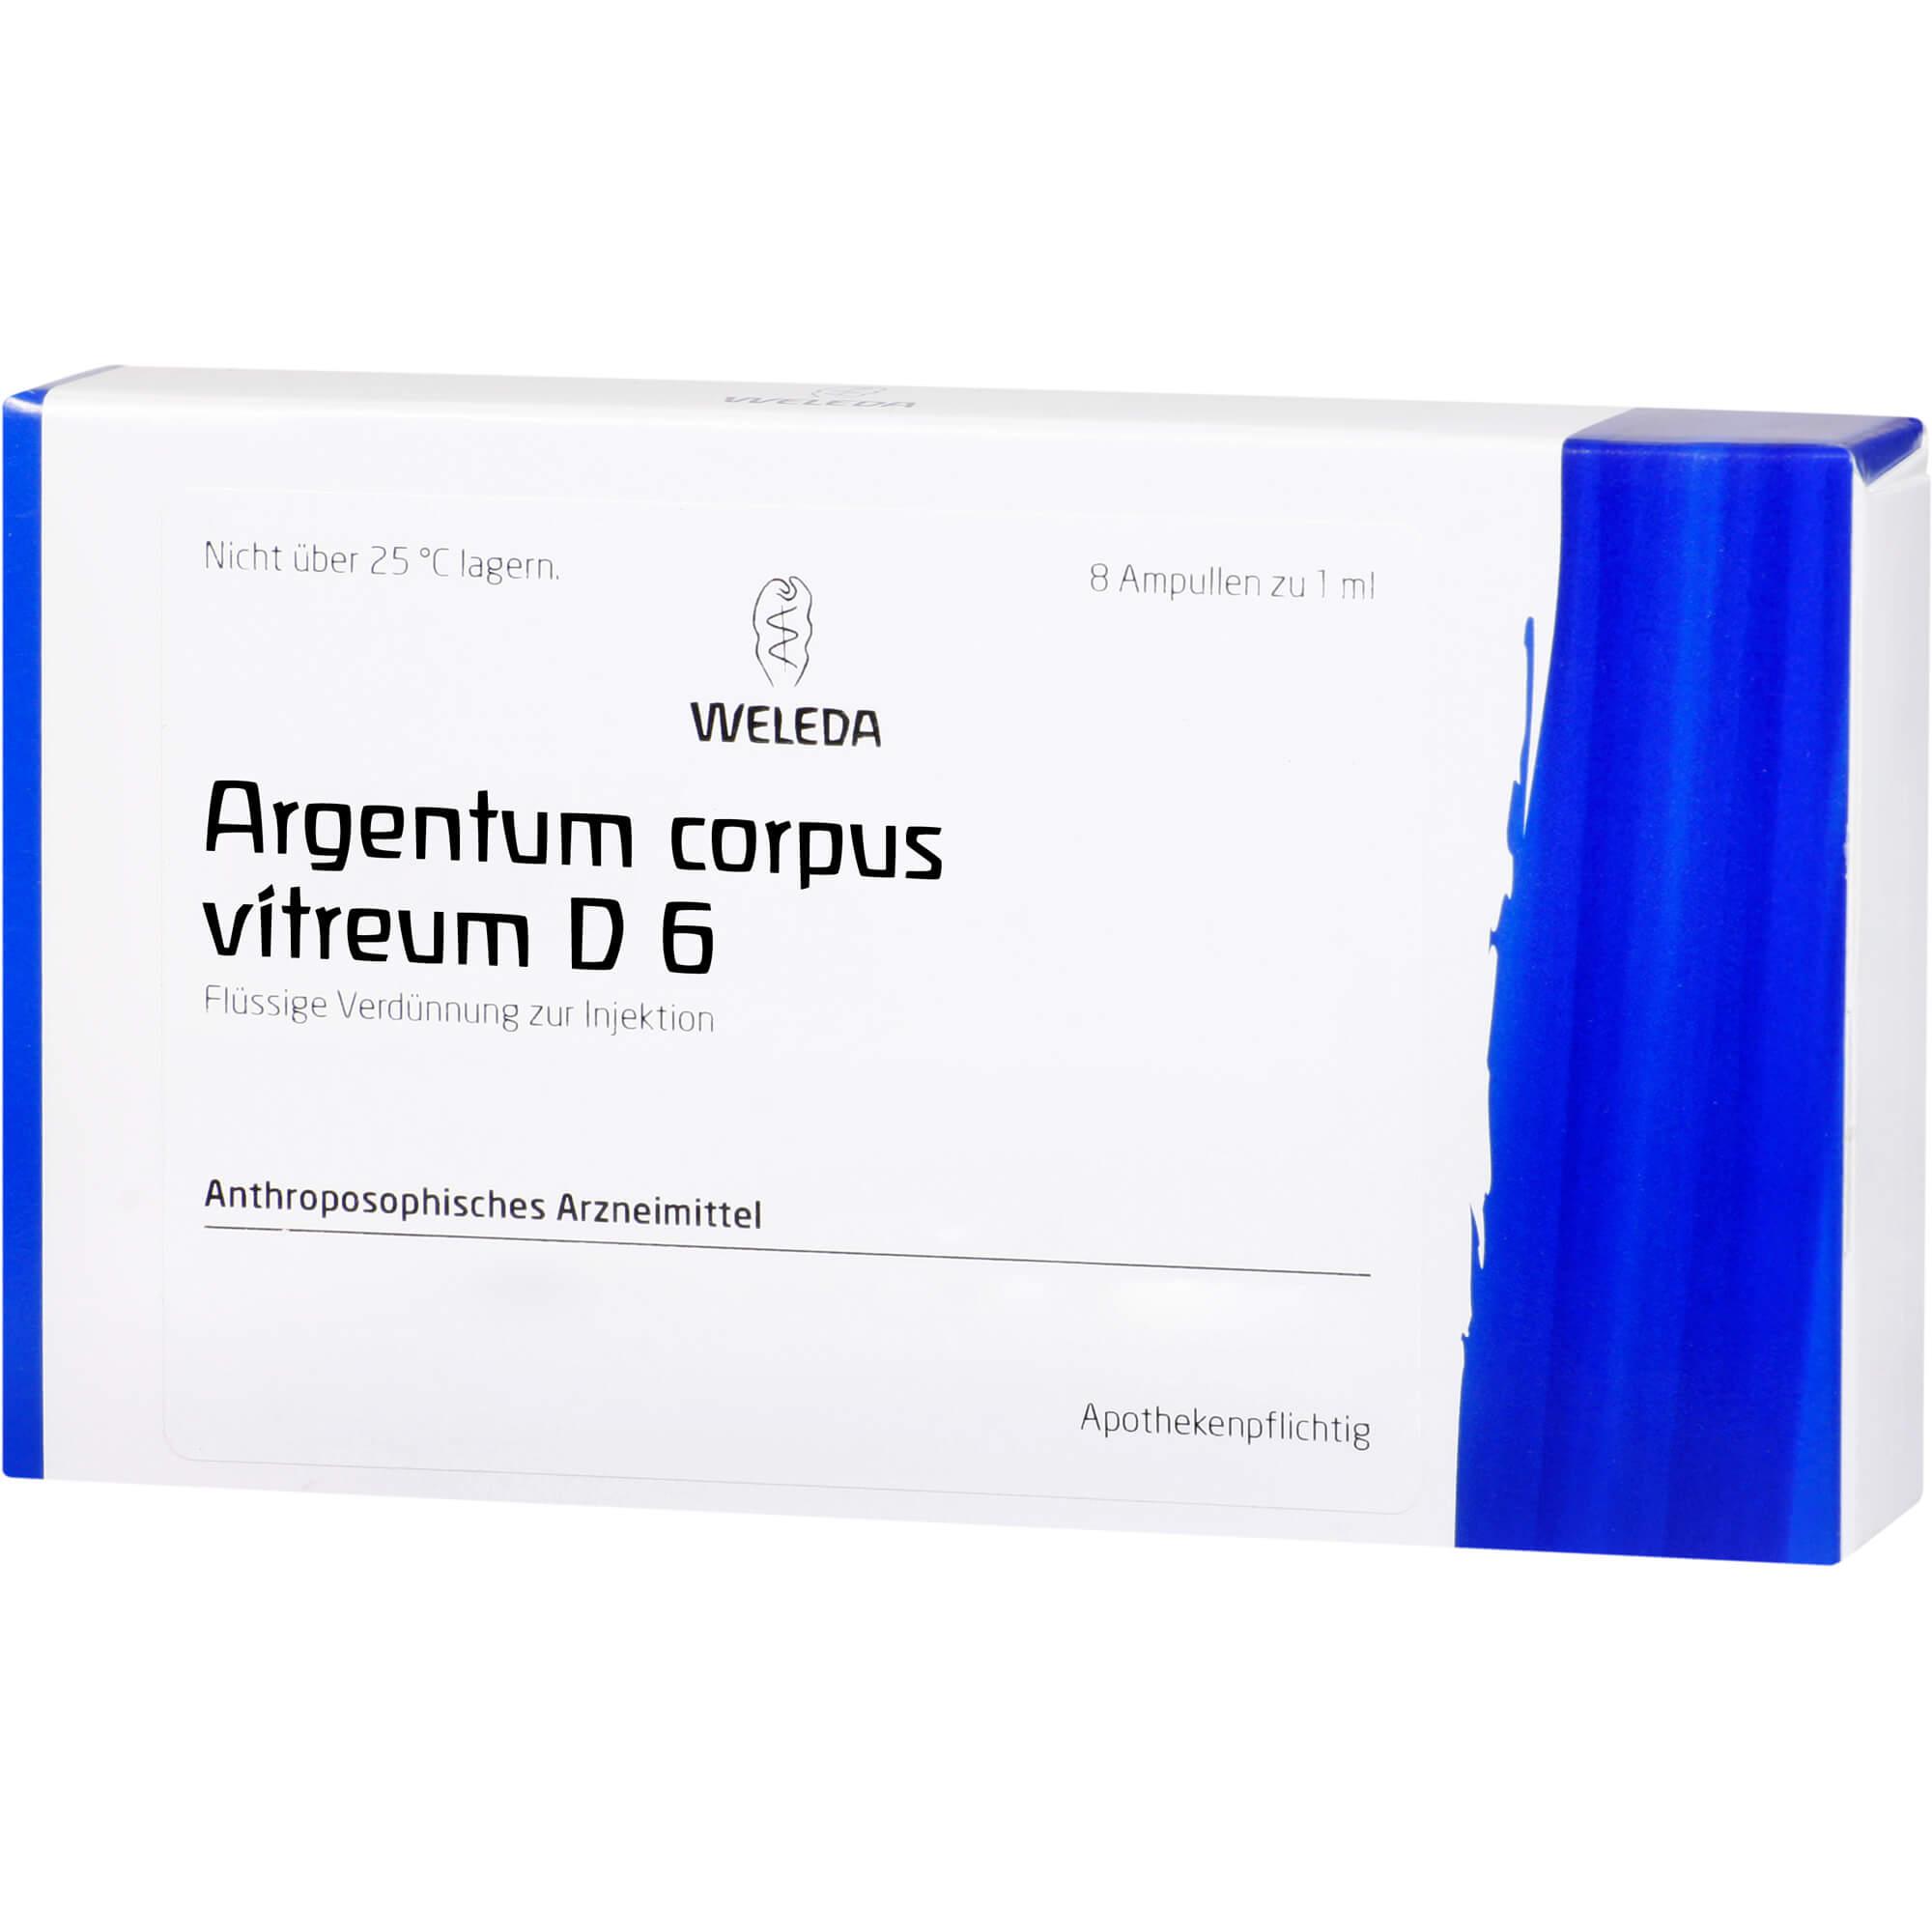 ARGENTUM CORP VIT D 6, 8X1 ml | Arzneimittel-Datenbank